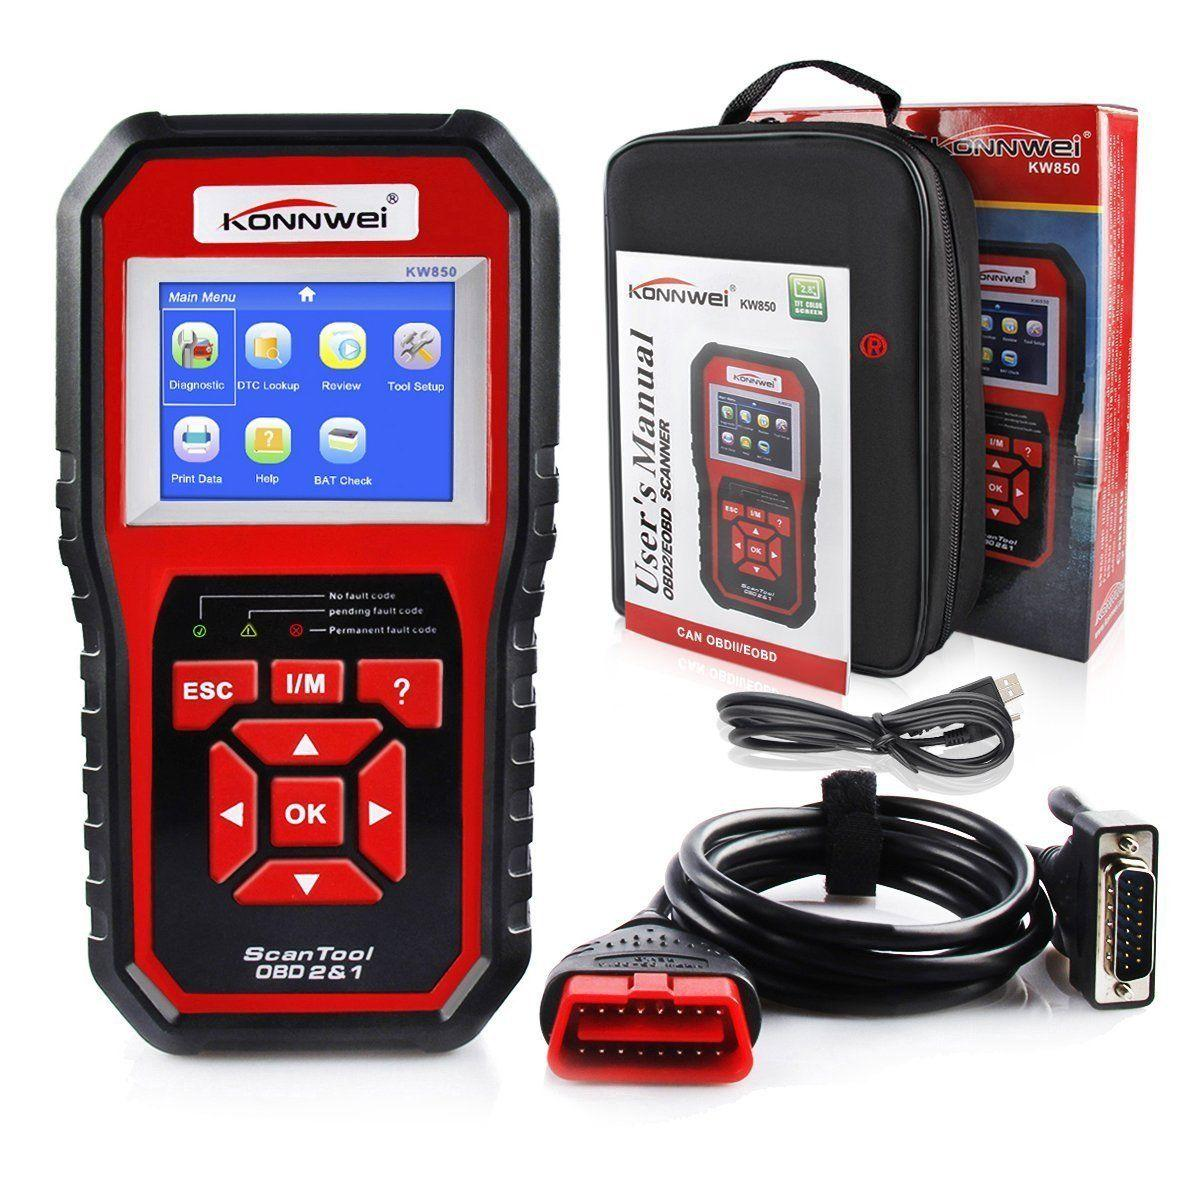 New KONNWEI KW850 OBDII OBD2 EOBD Car Auto Codes Reader Diagnostic Scanner Tool 12V With Retail box UPS DHL Free Shipping